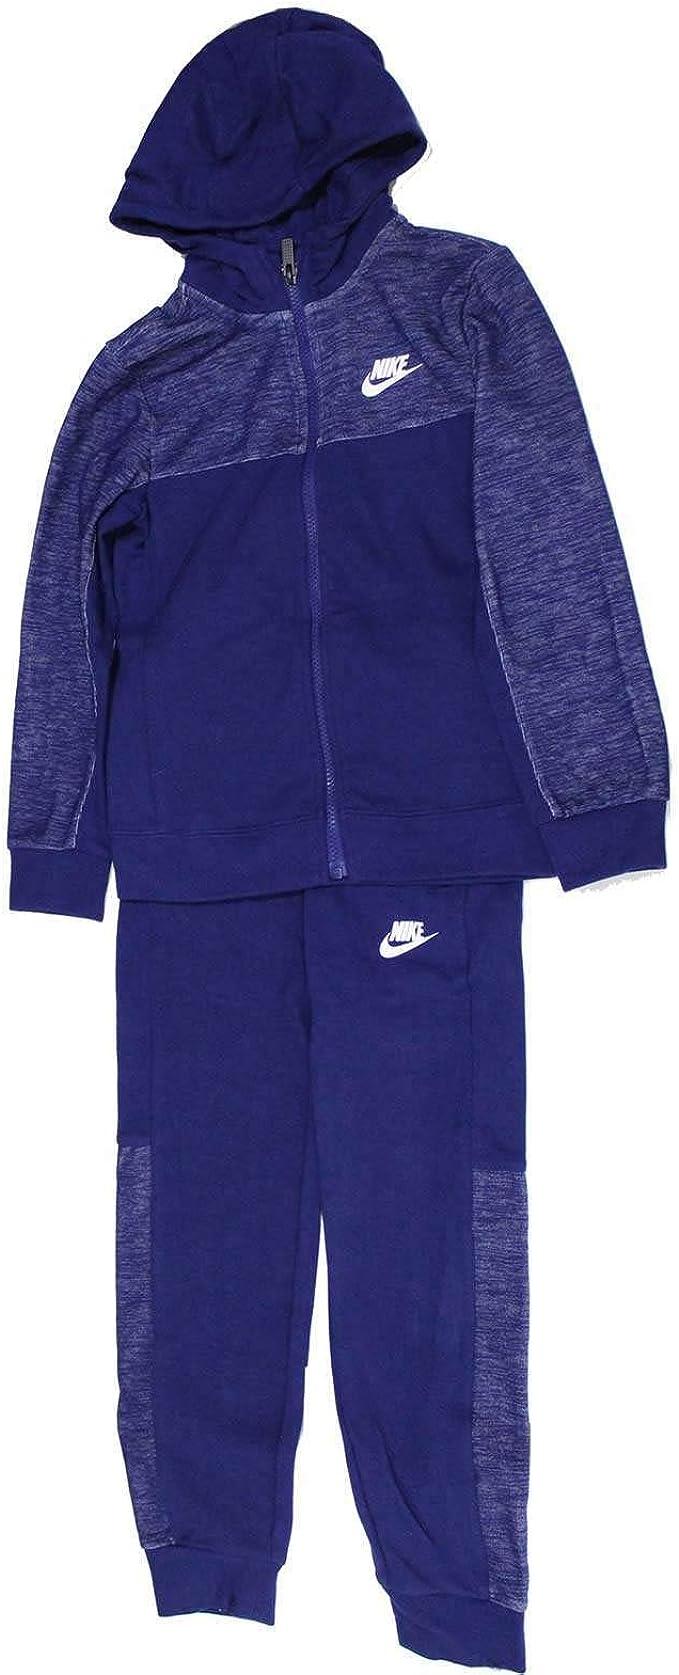 Nike 8UD633-U9J - Chándal para niño, Color Azul Turquesa 5 años ...